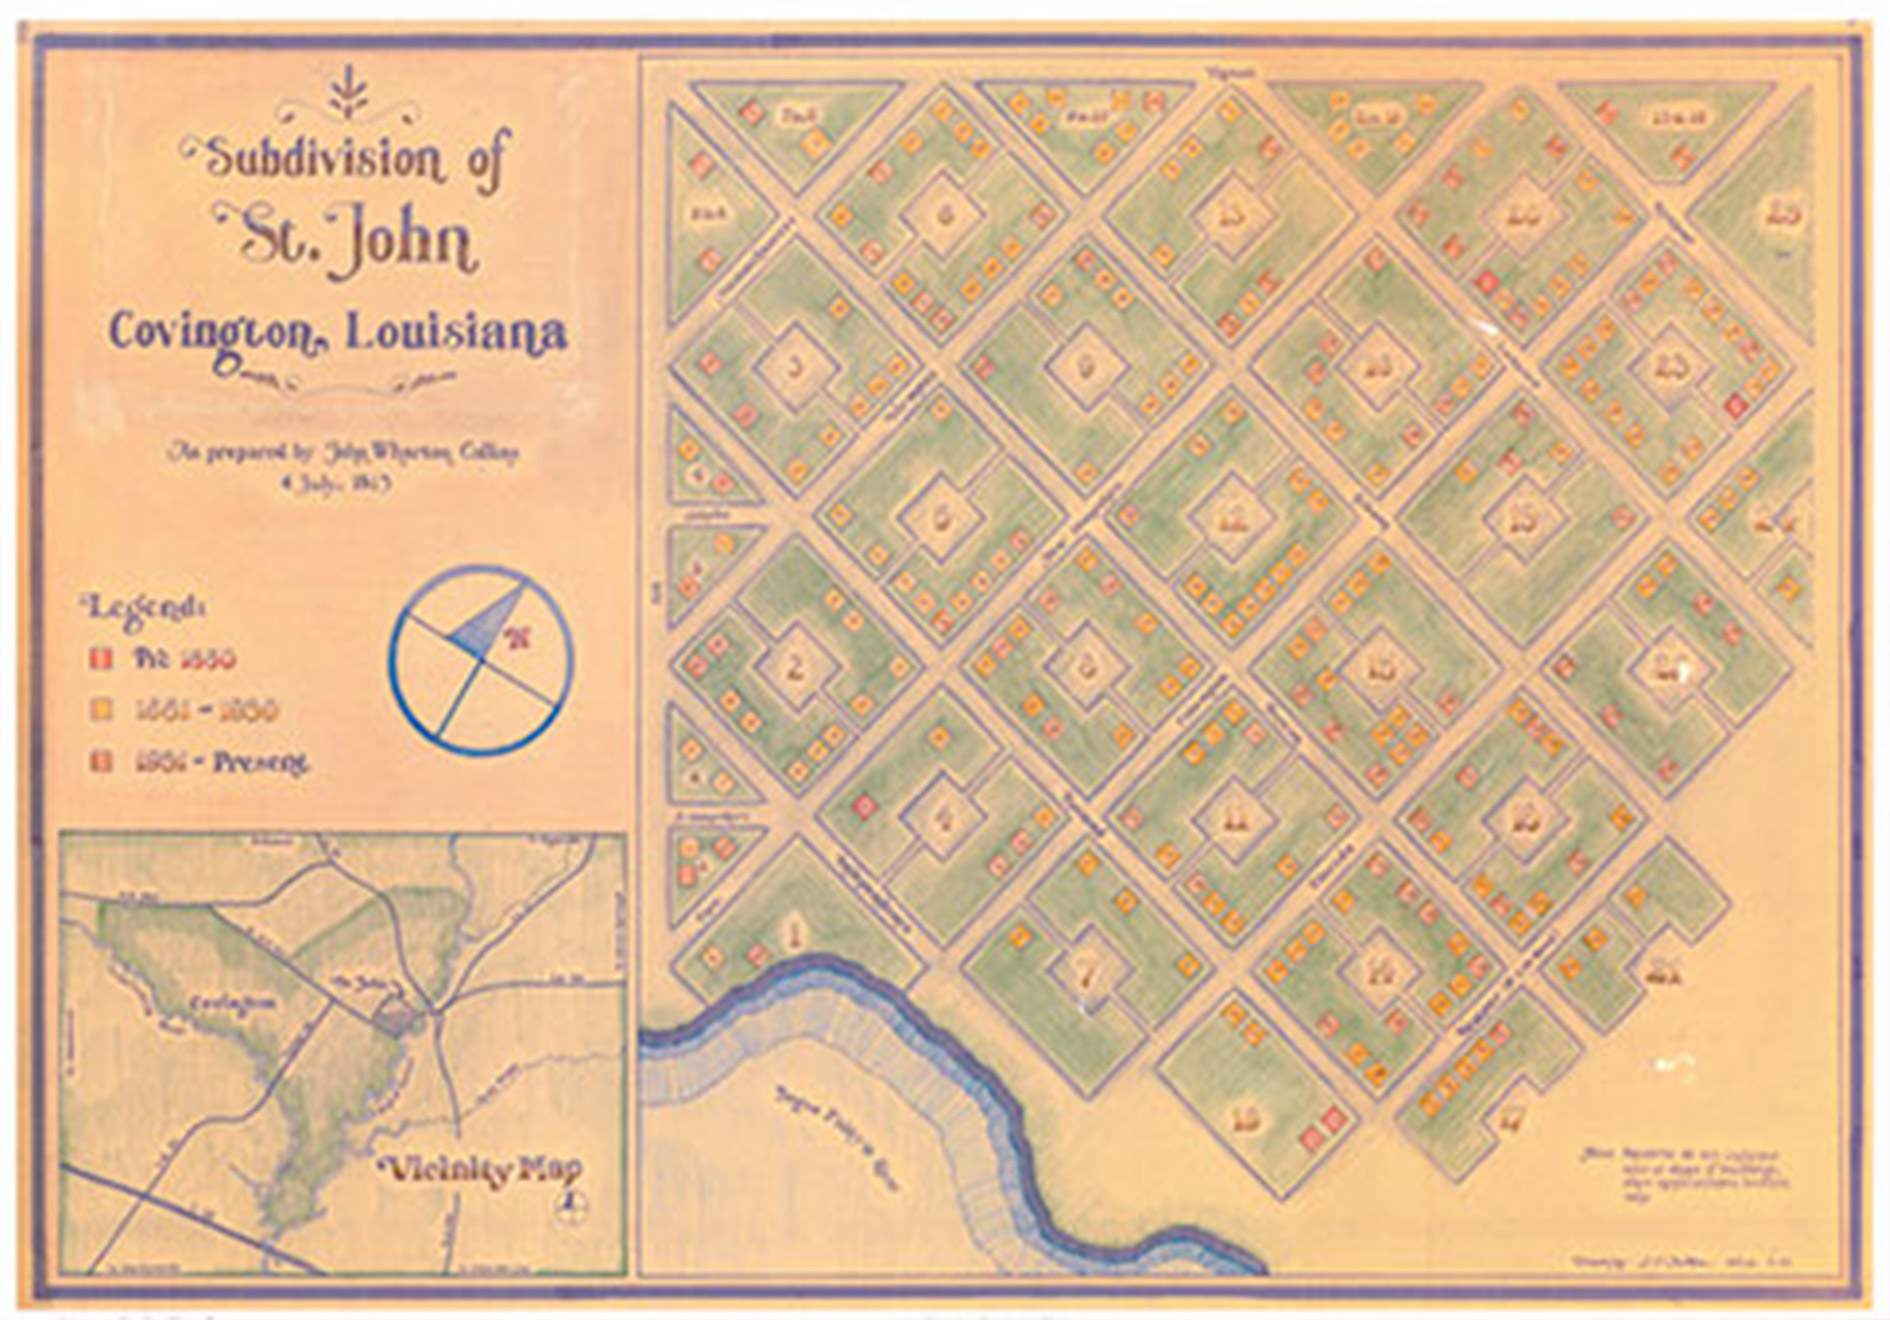 Subdivision of St. John